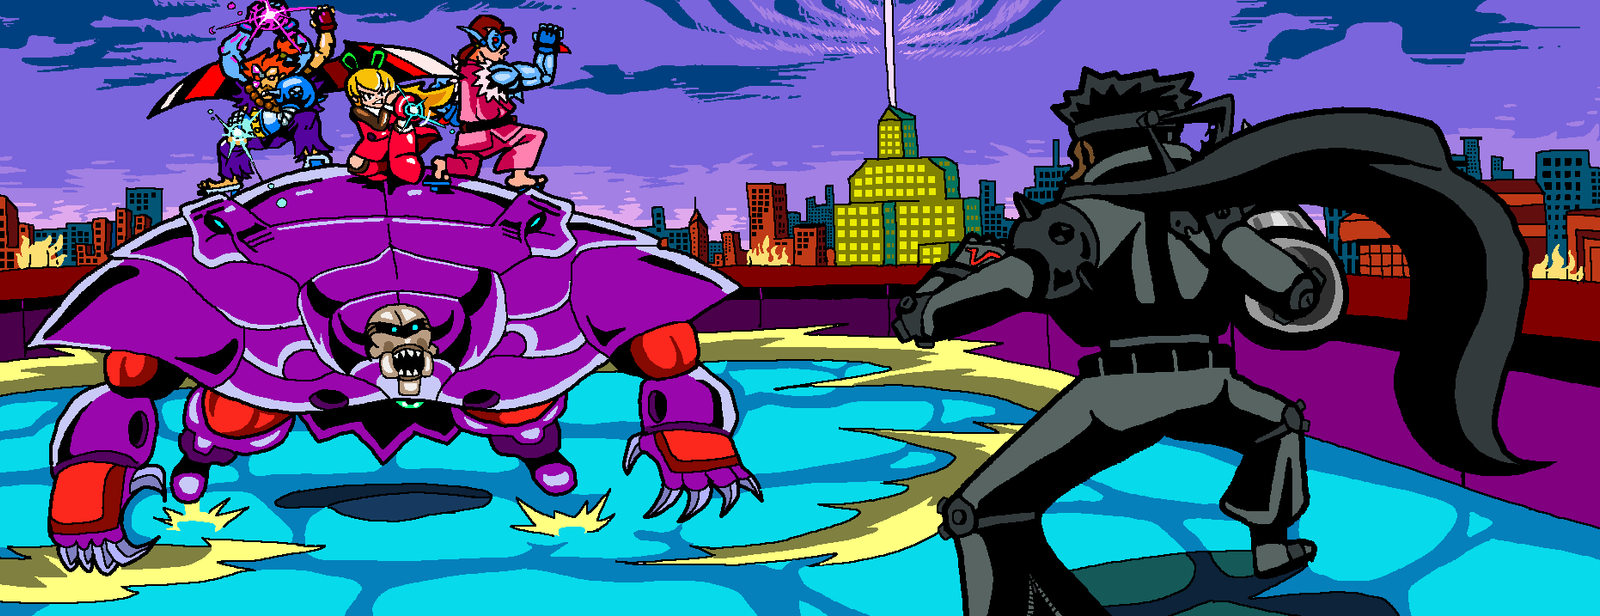 Mechanical Mayhem by darkchapel666